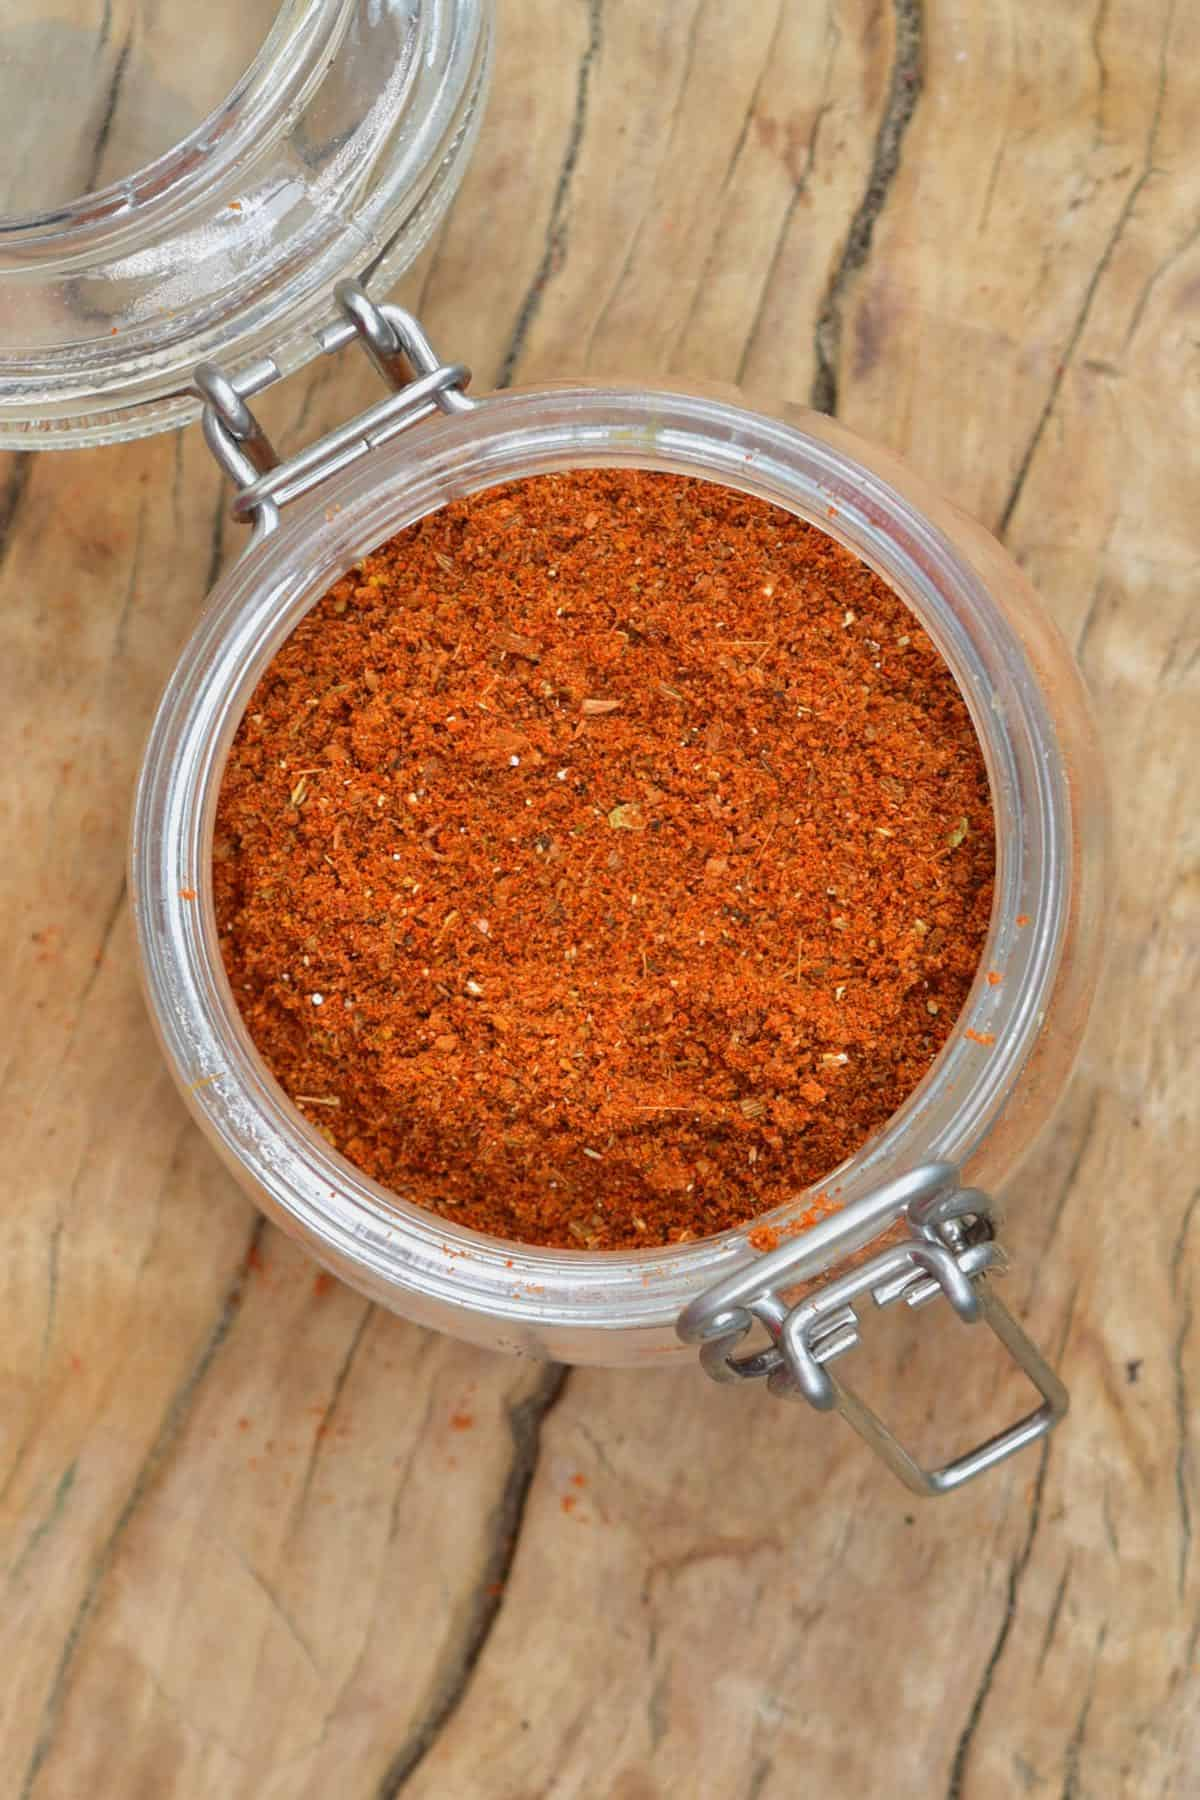 Shawarma spice mix in a jar